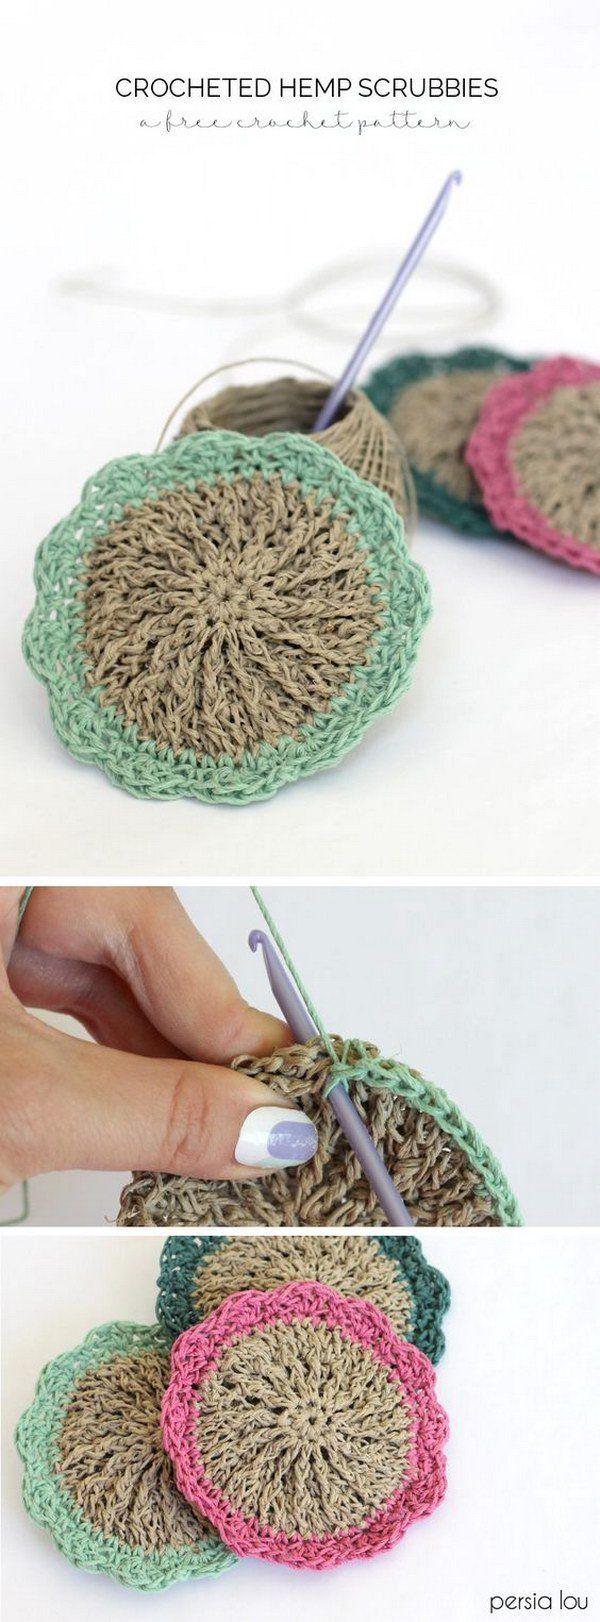 Crochet & Knitted Dishcloth Patterns   Bordes de ganchillo y Ganchillo